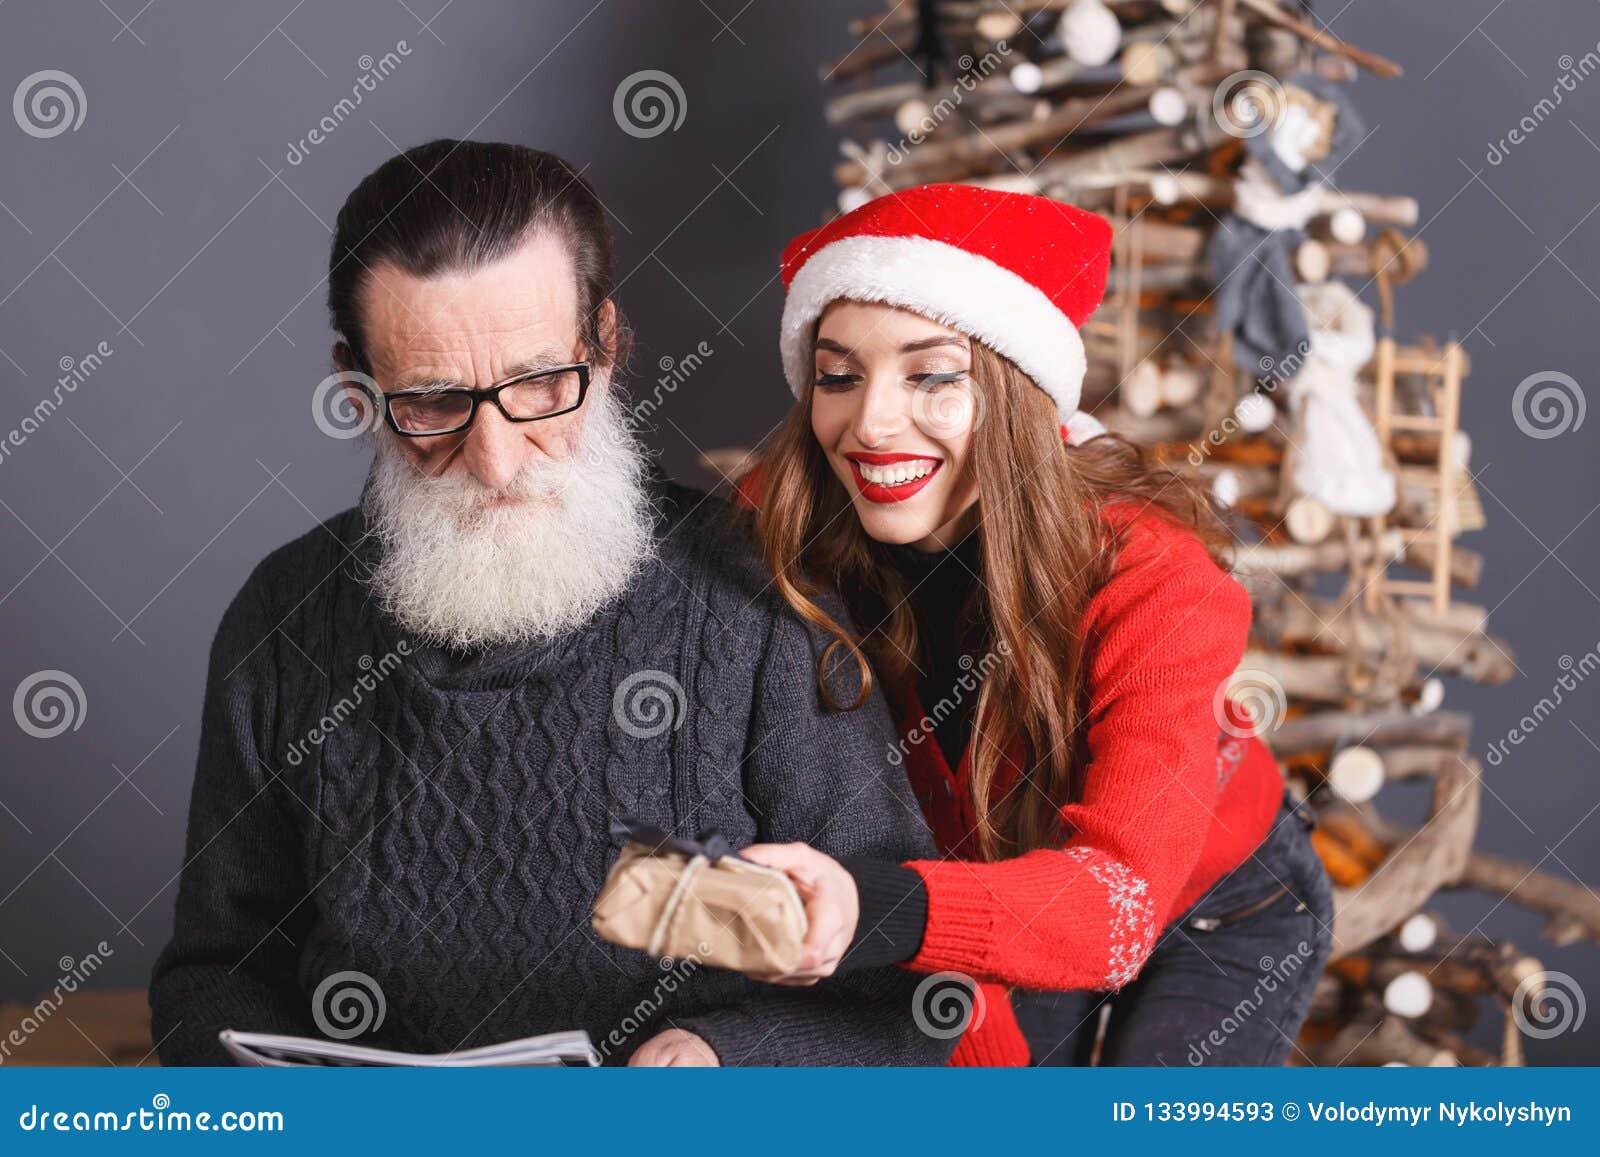 La hija da un regalo a su papá